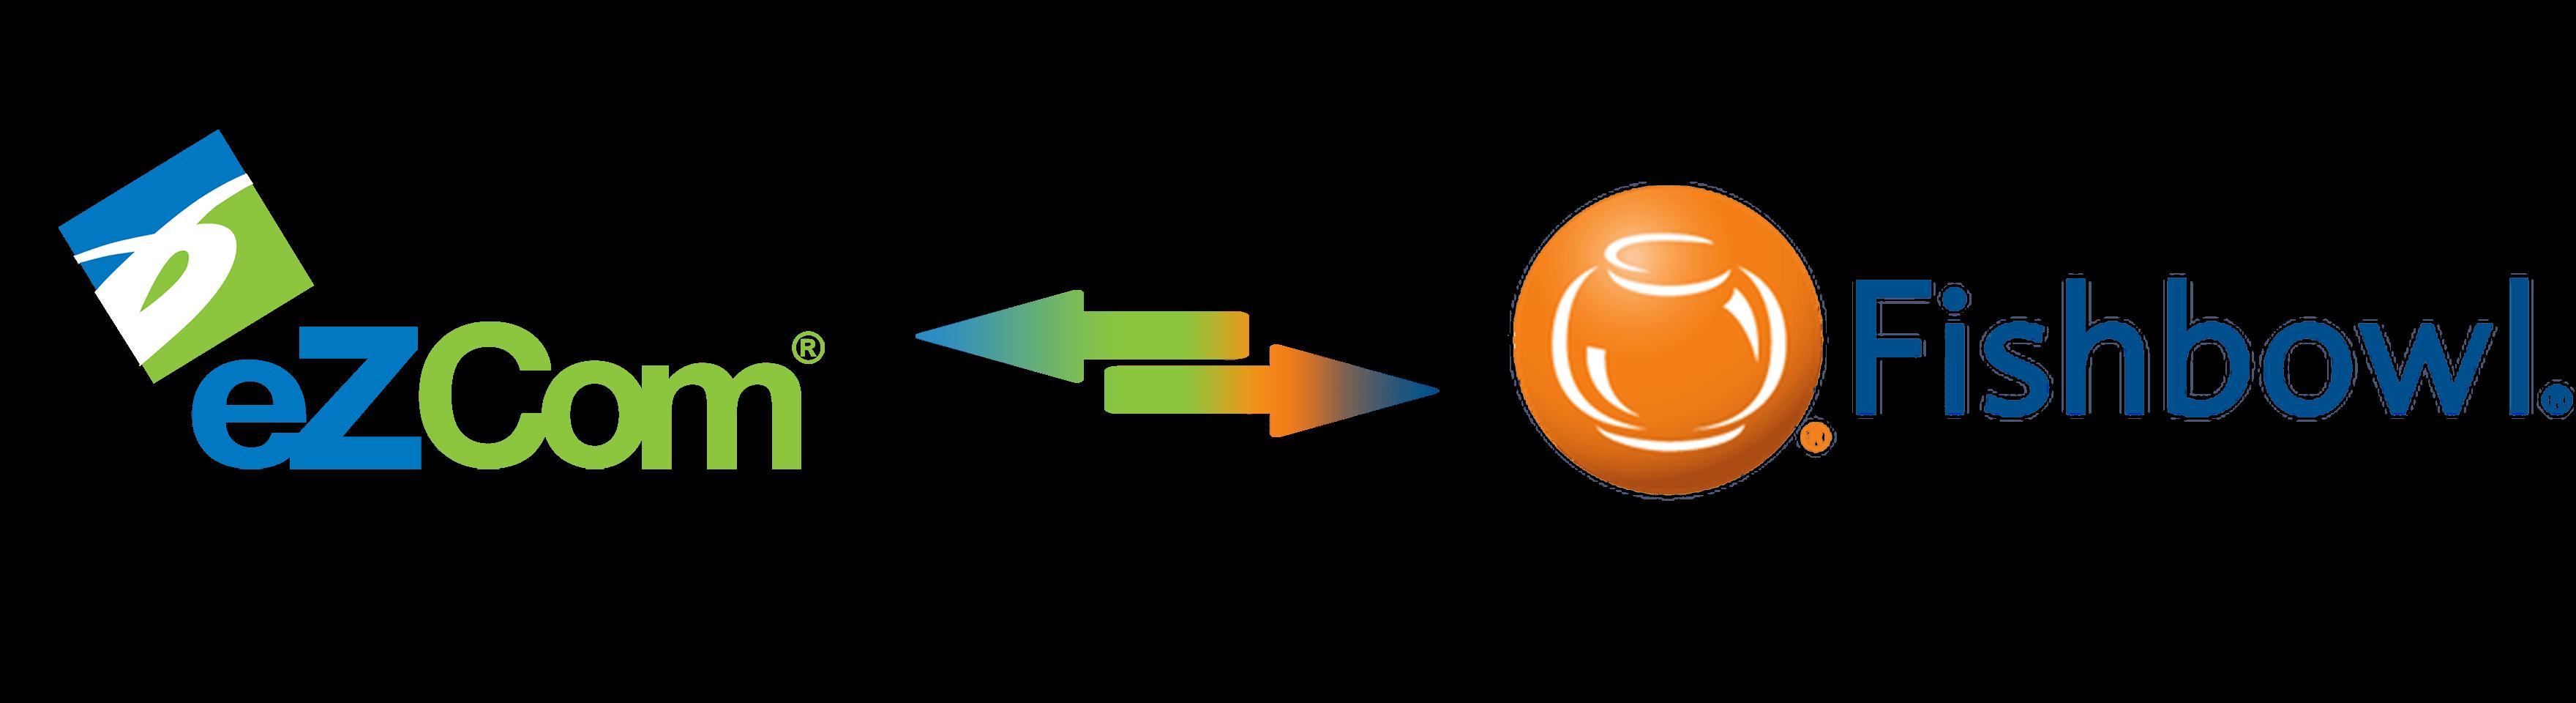 eZCom integrates with Fishbowl